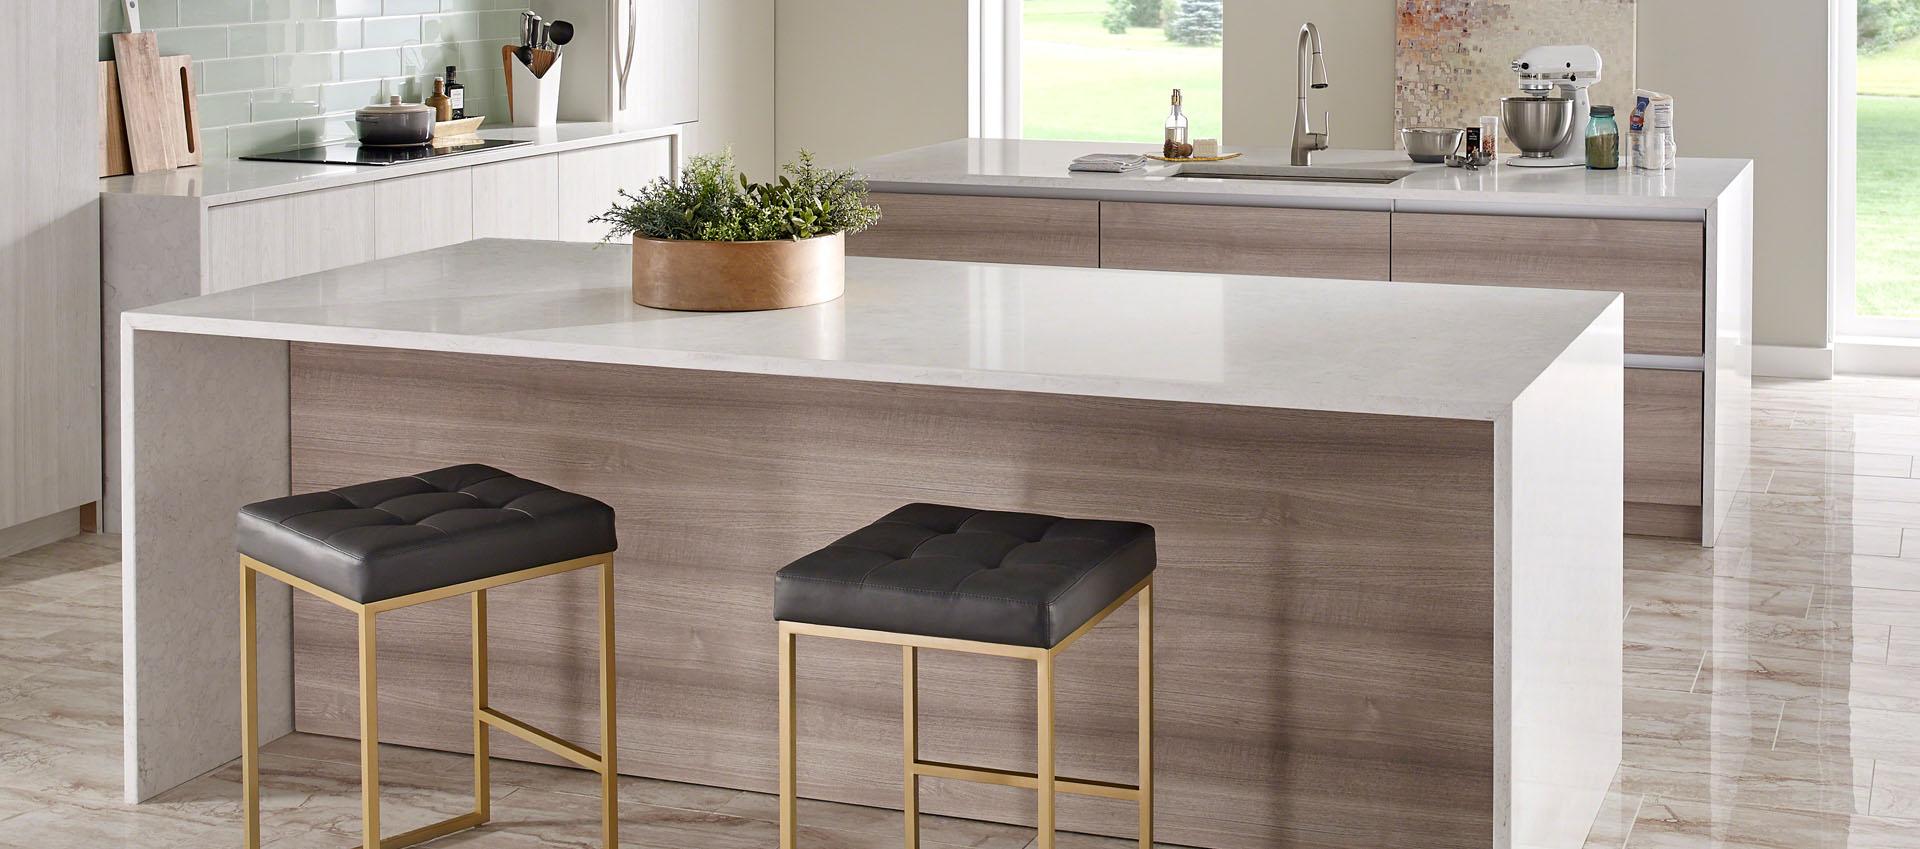 Premium natural quartz countertops wilkes barre kitchen for 2 inch quartz countertop